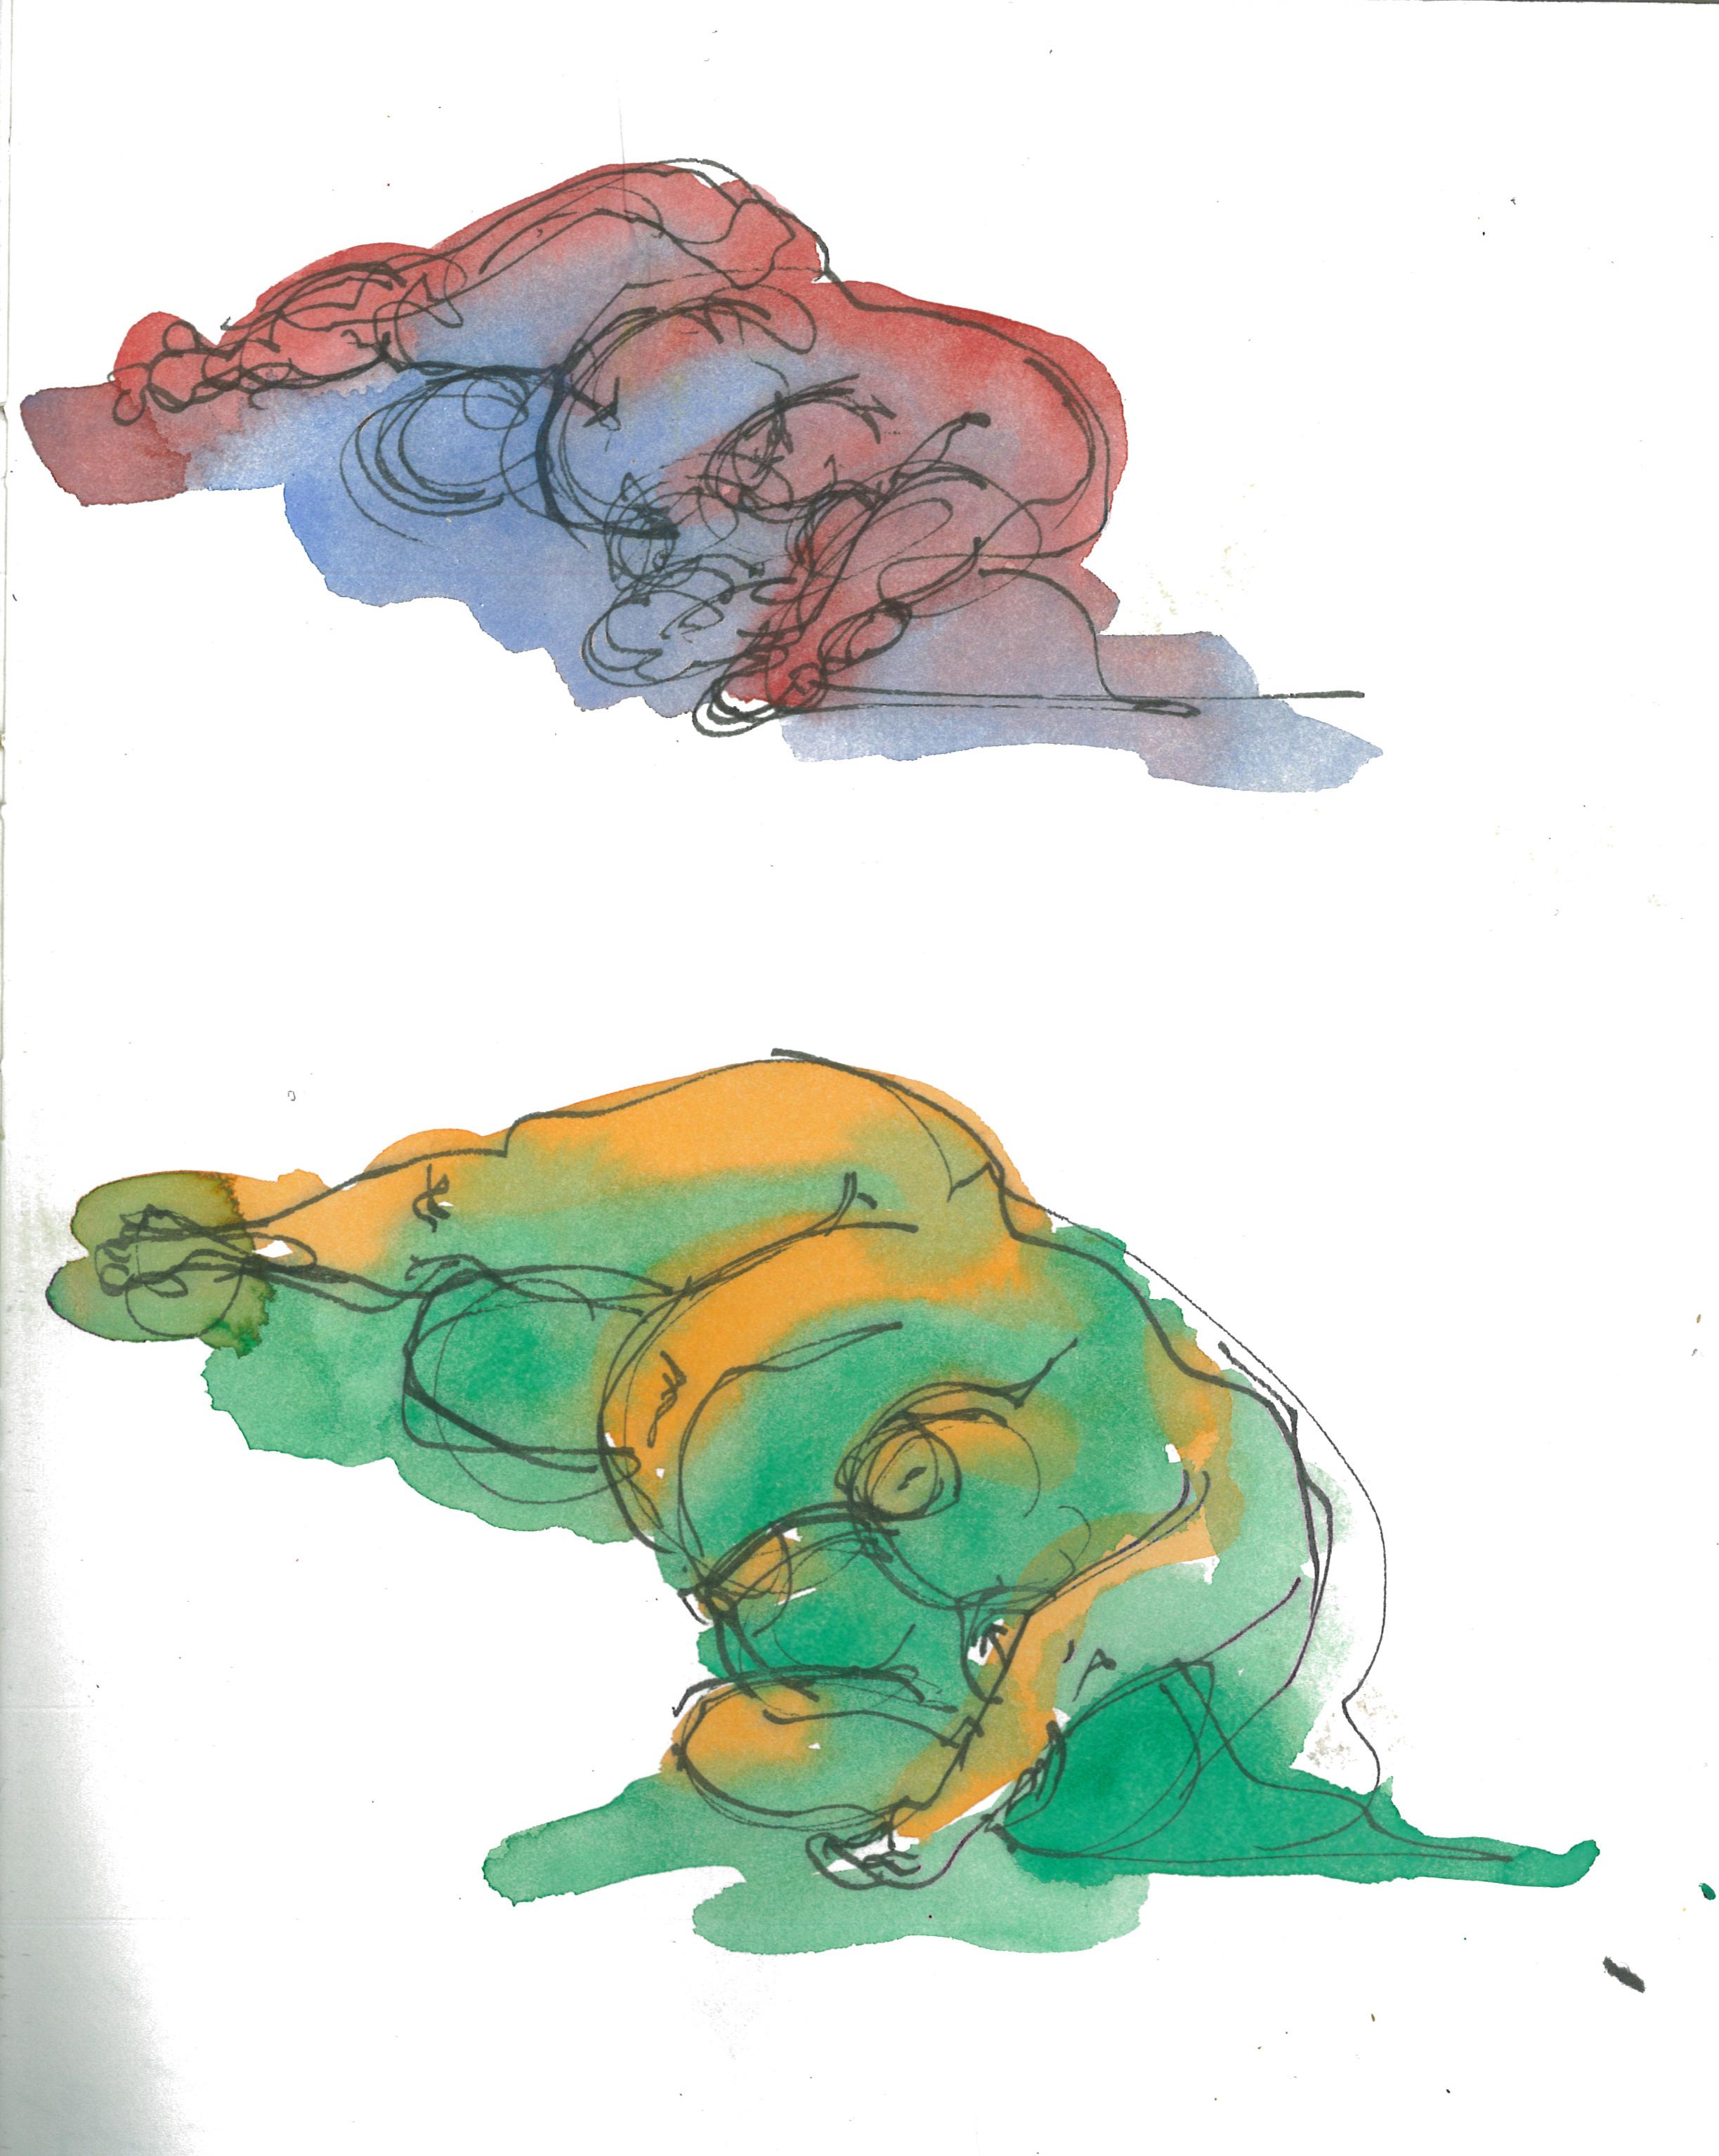 FIGURE_2_SketchbookA_ScanE_Page_3.jpg